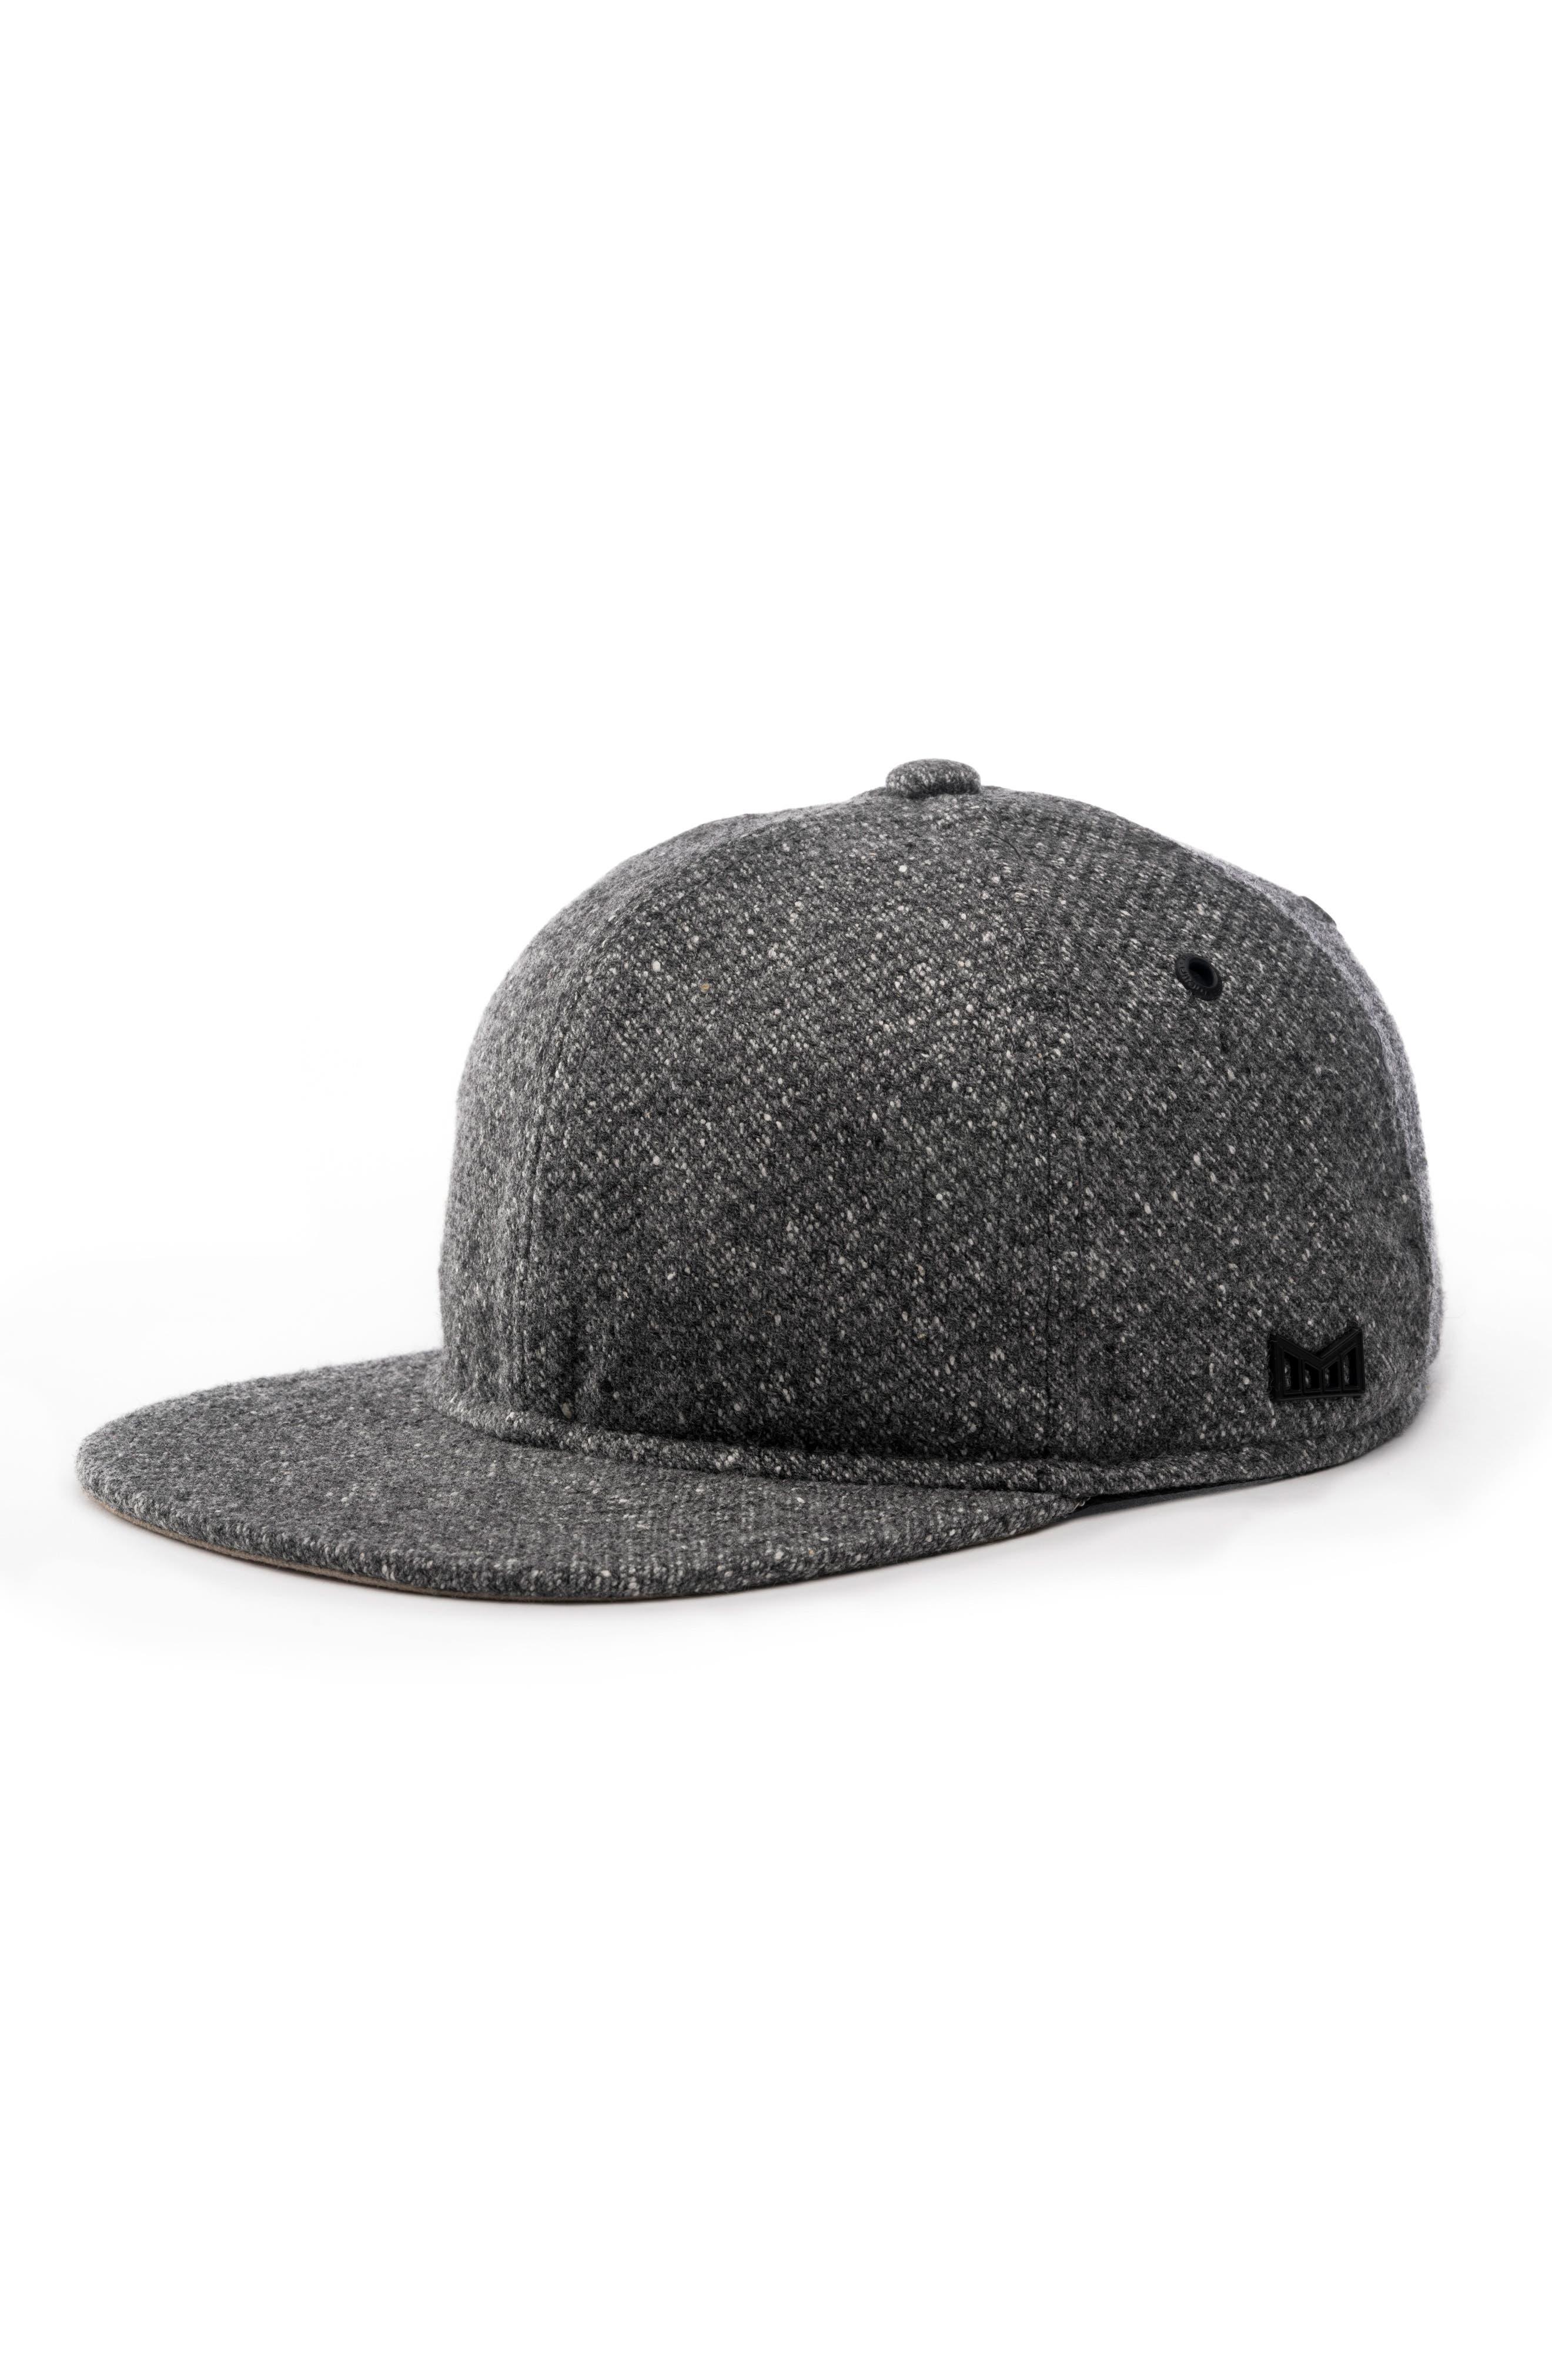 Melin Kingpin Ball Cap